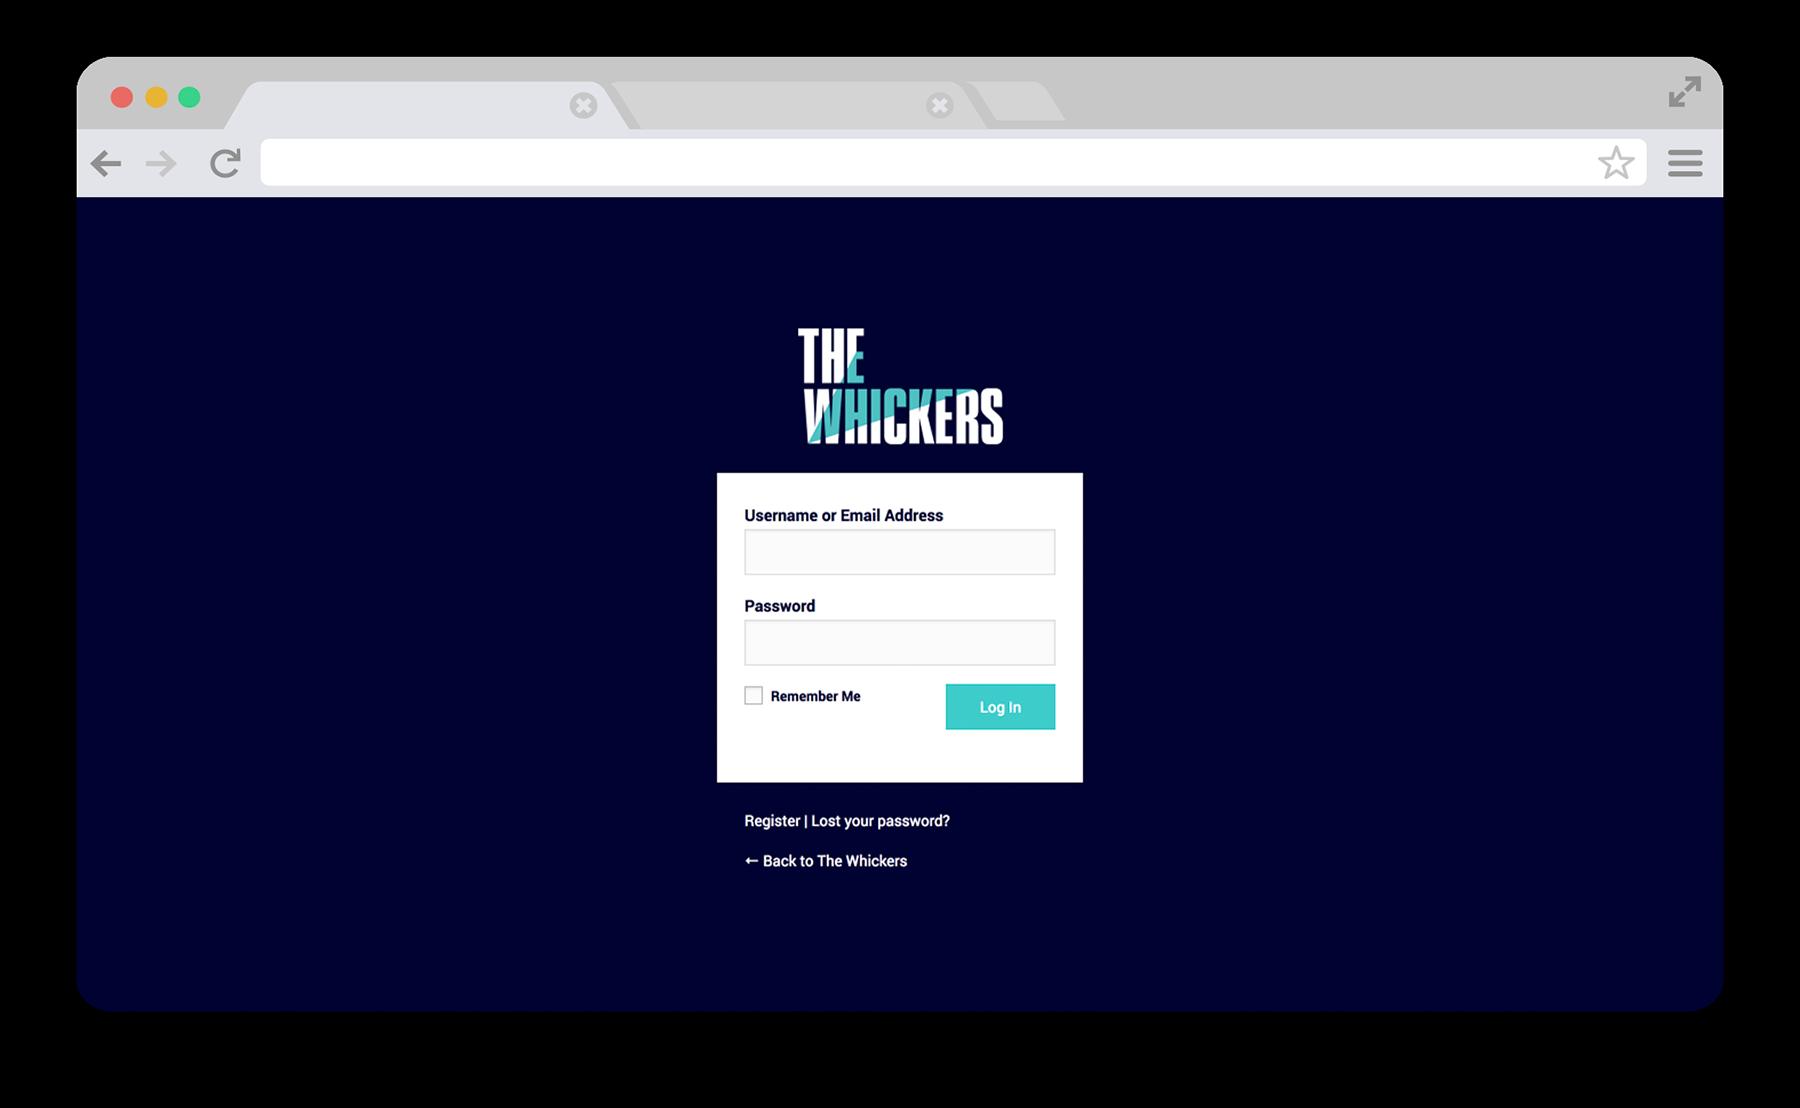 The Whickers Desktop Screenshot 2